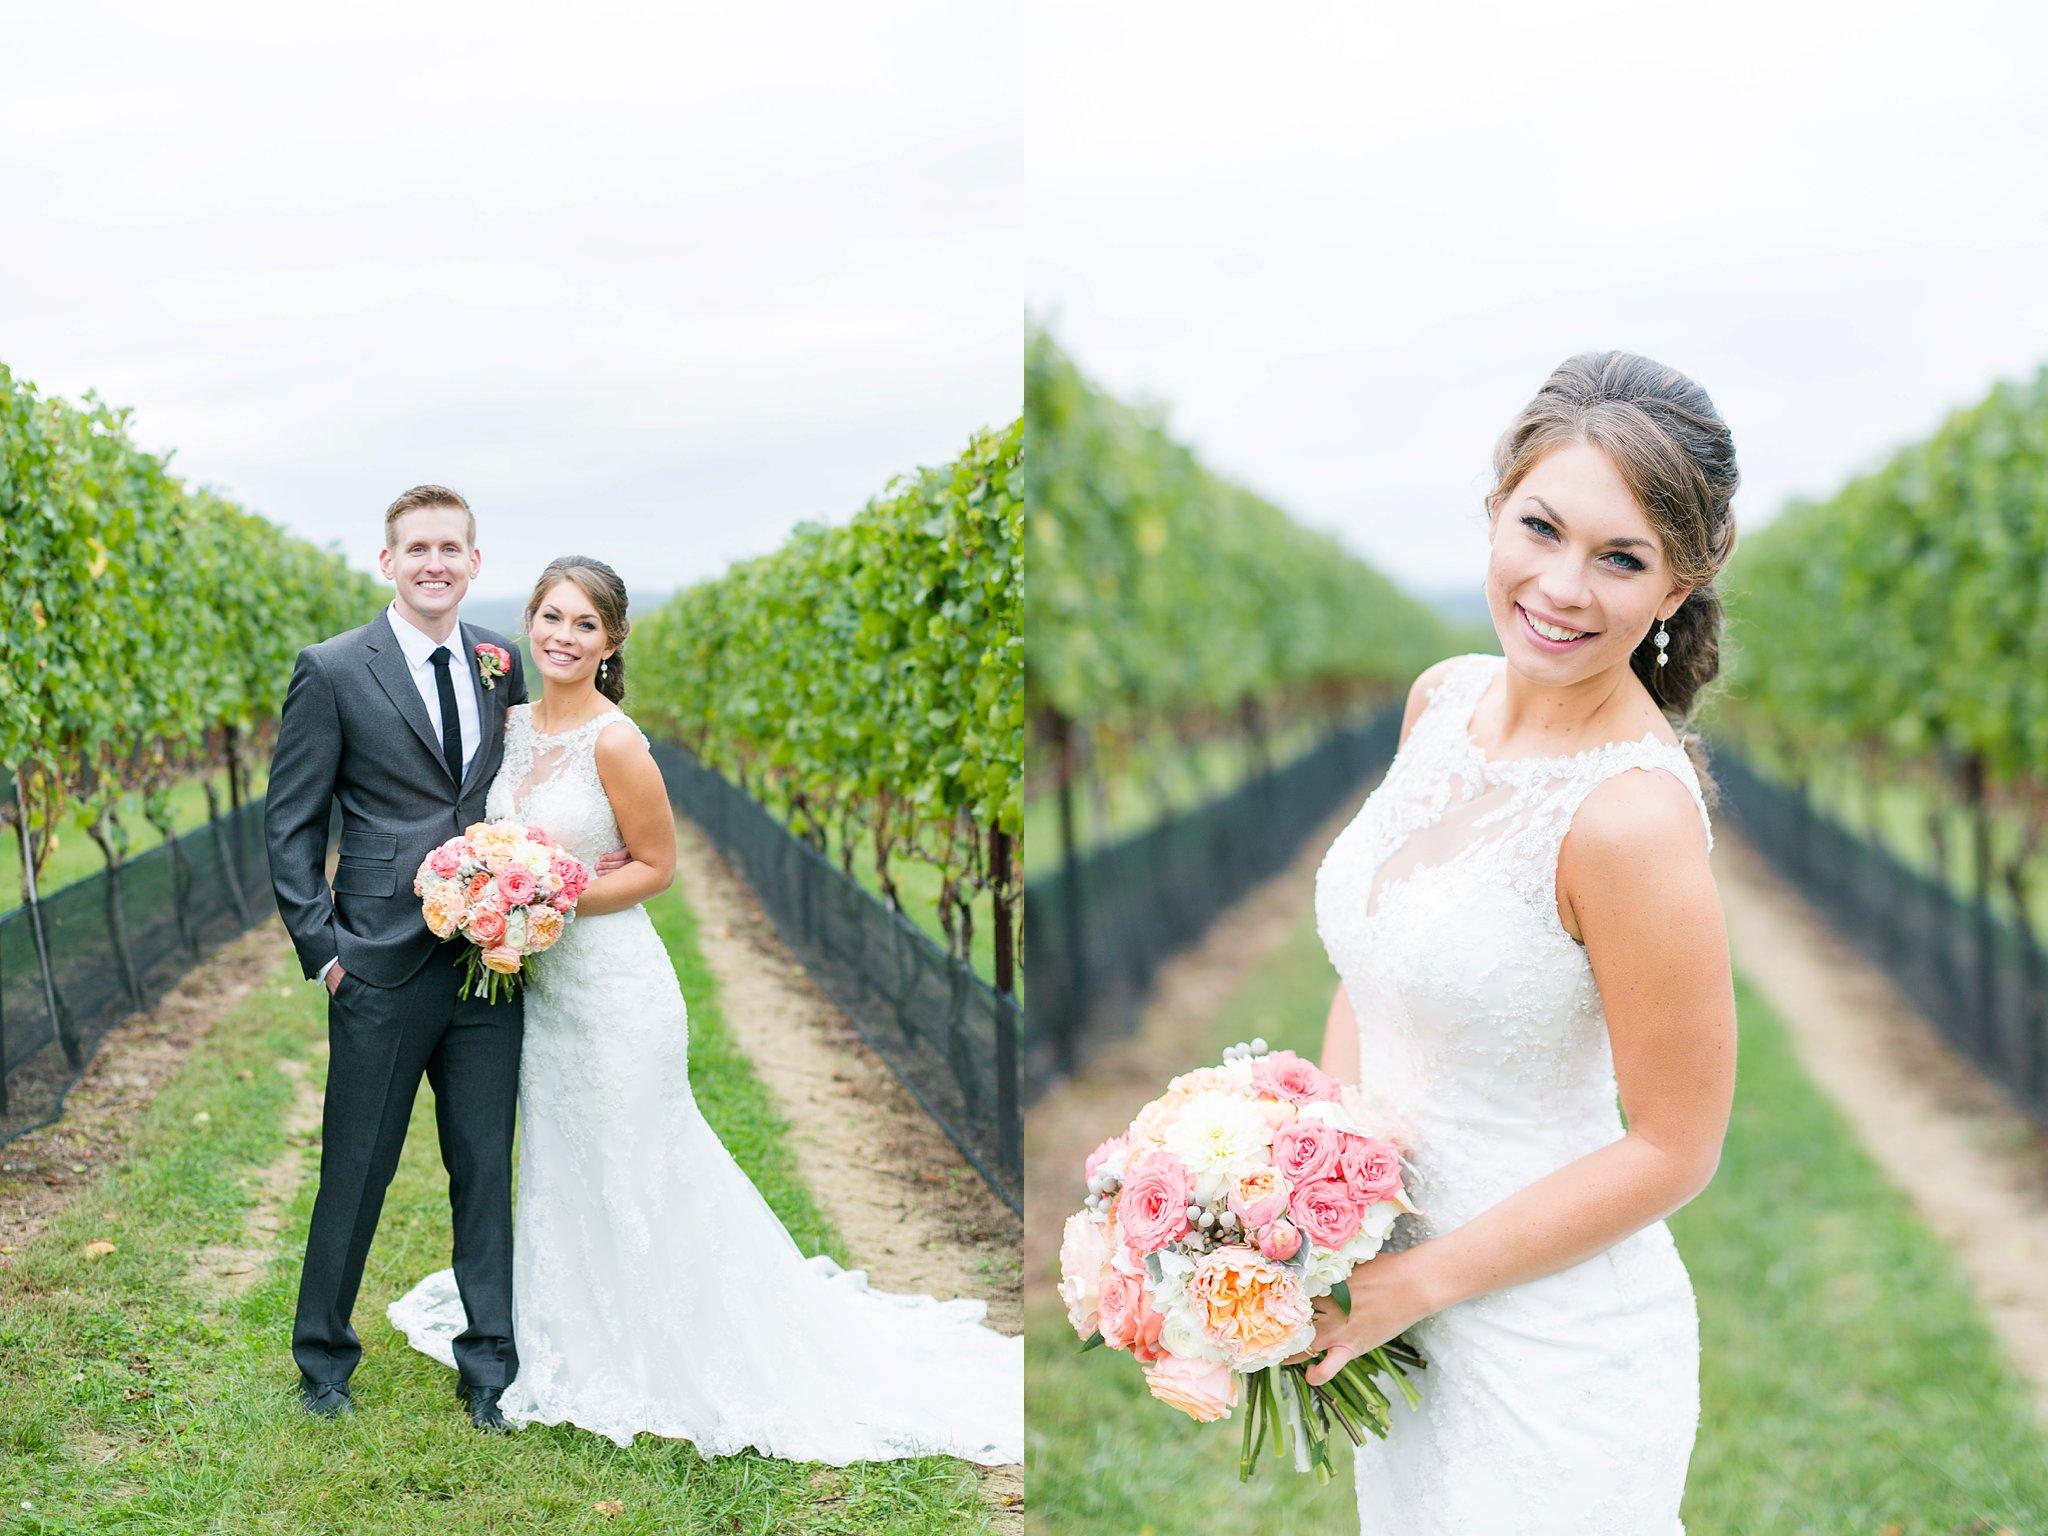 Stone Tower Winery Wedding Photos Virginia Wedding Photographer Megan Kelsey Photography Sam & Angela-207.jpg